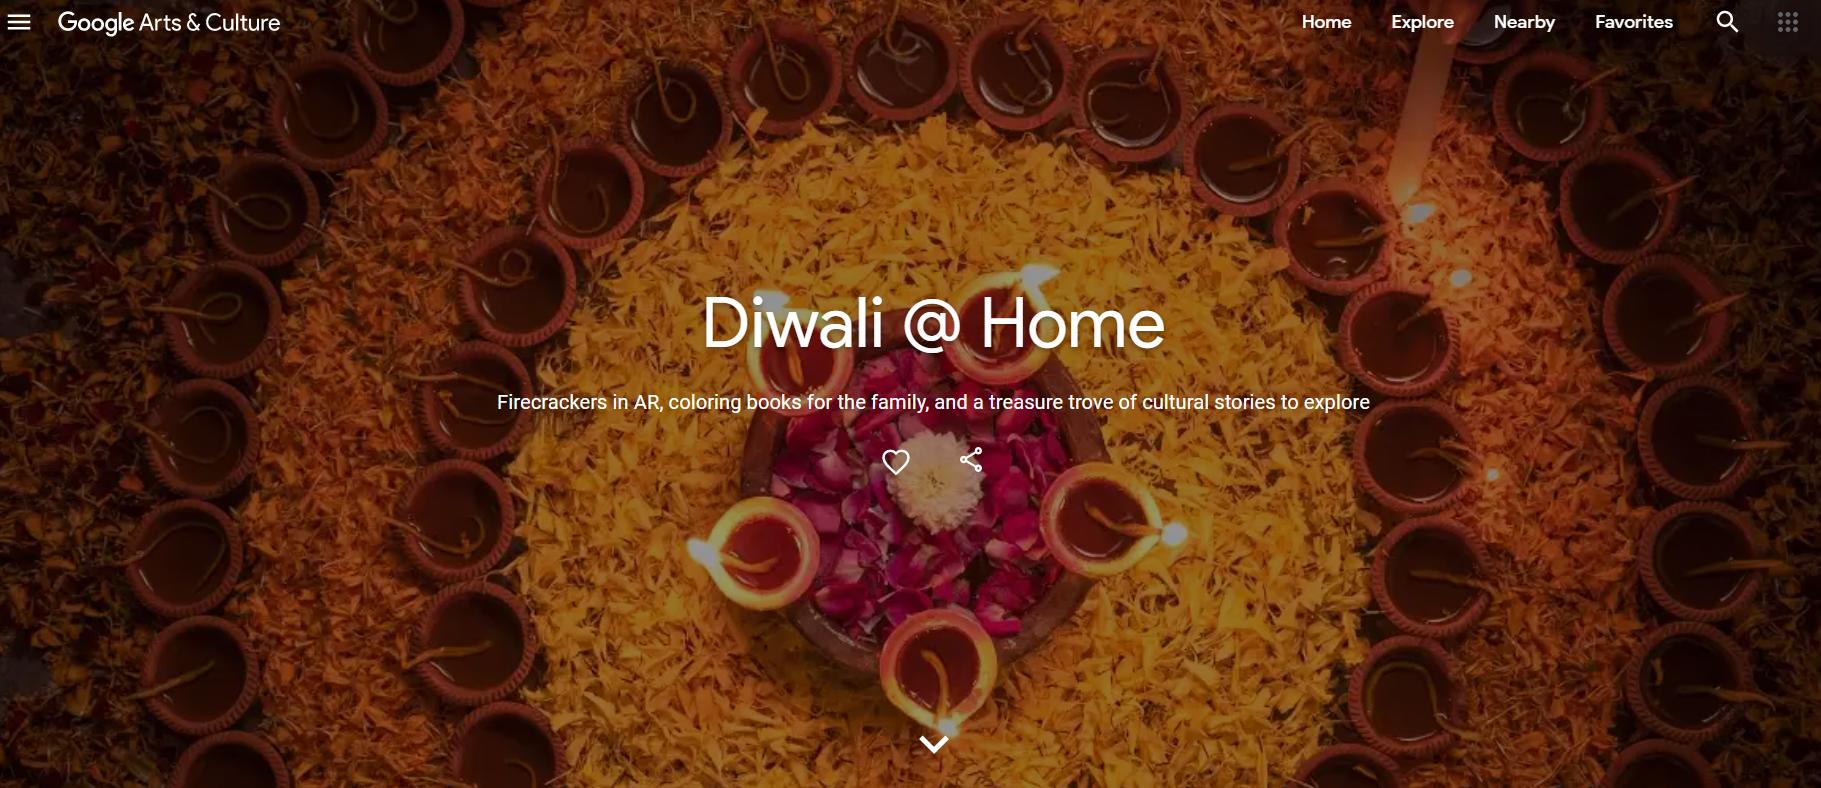 Google virtual diwali